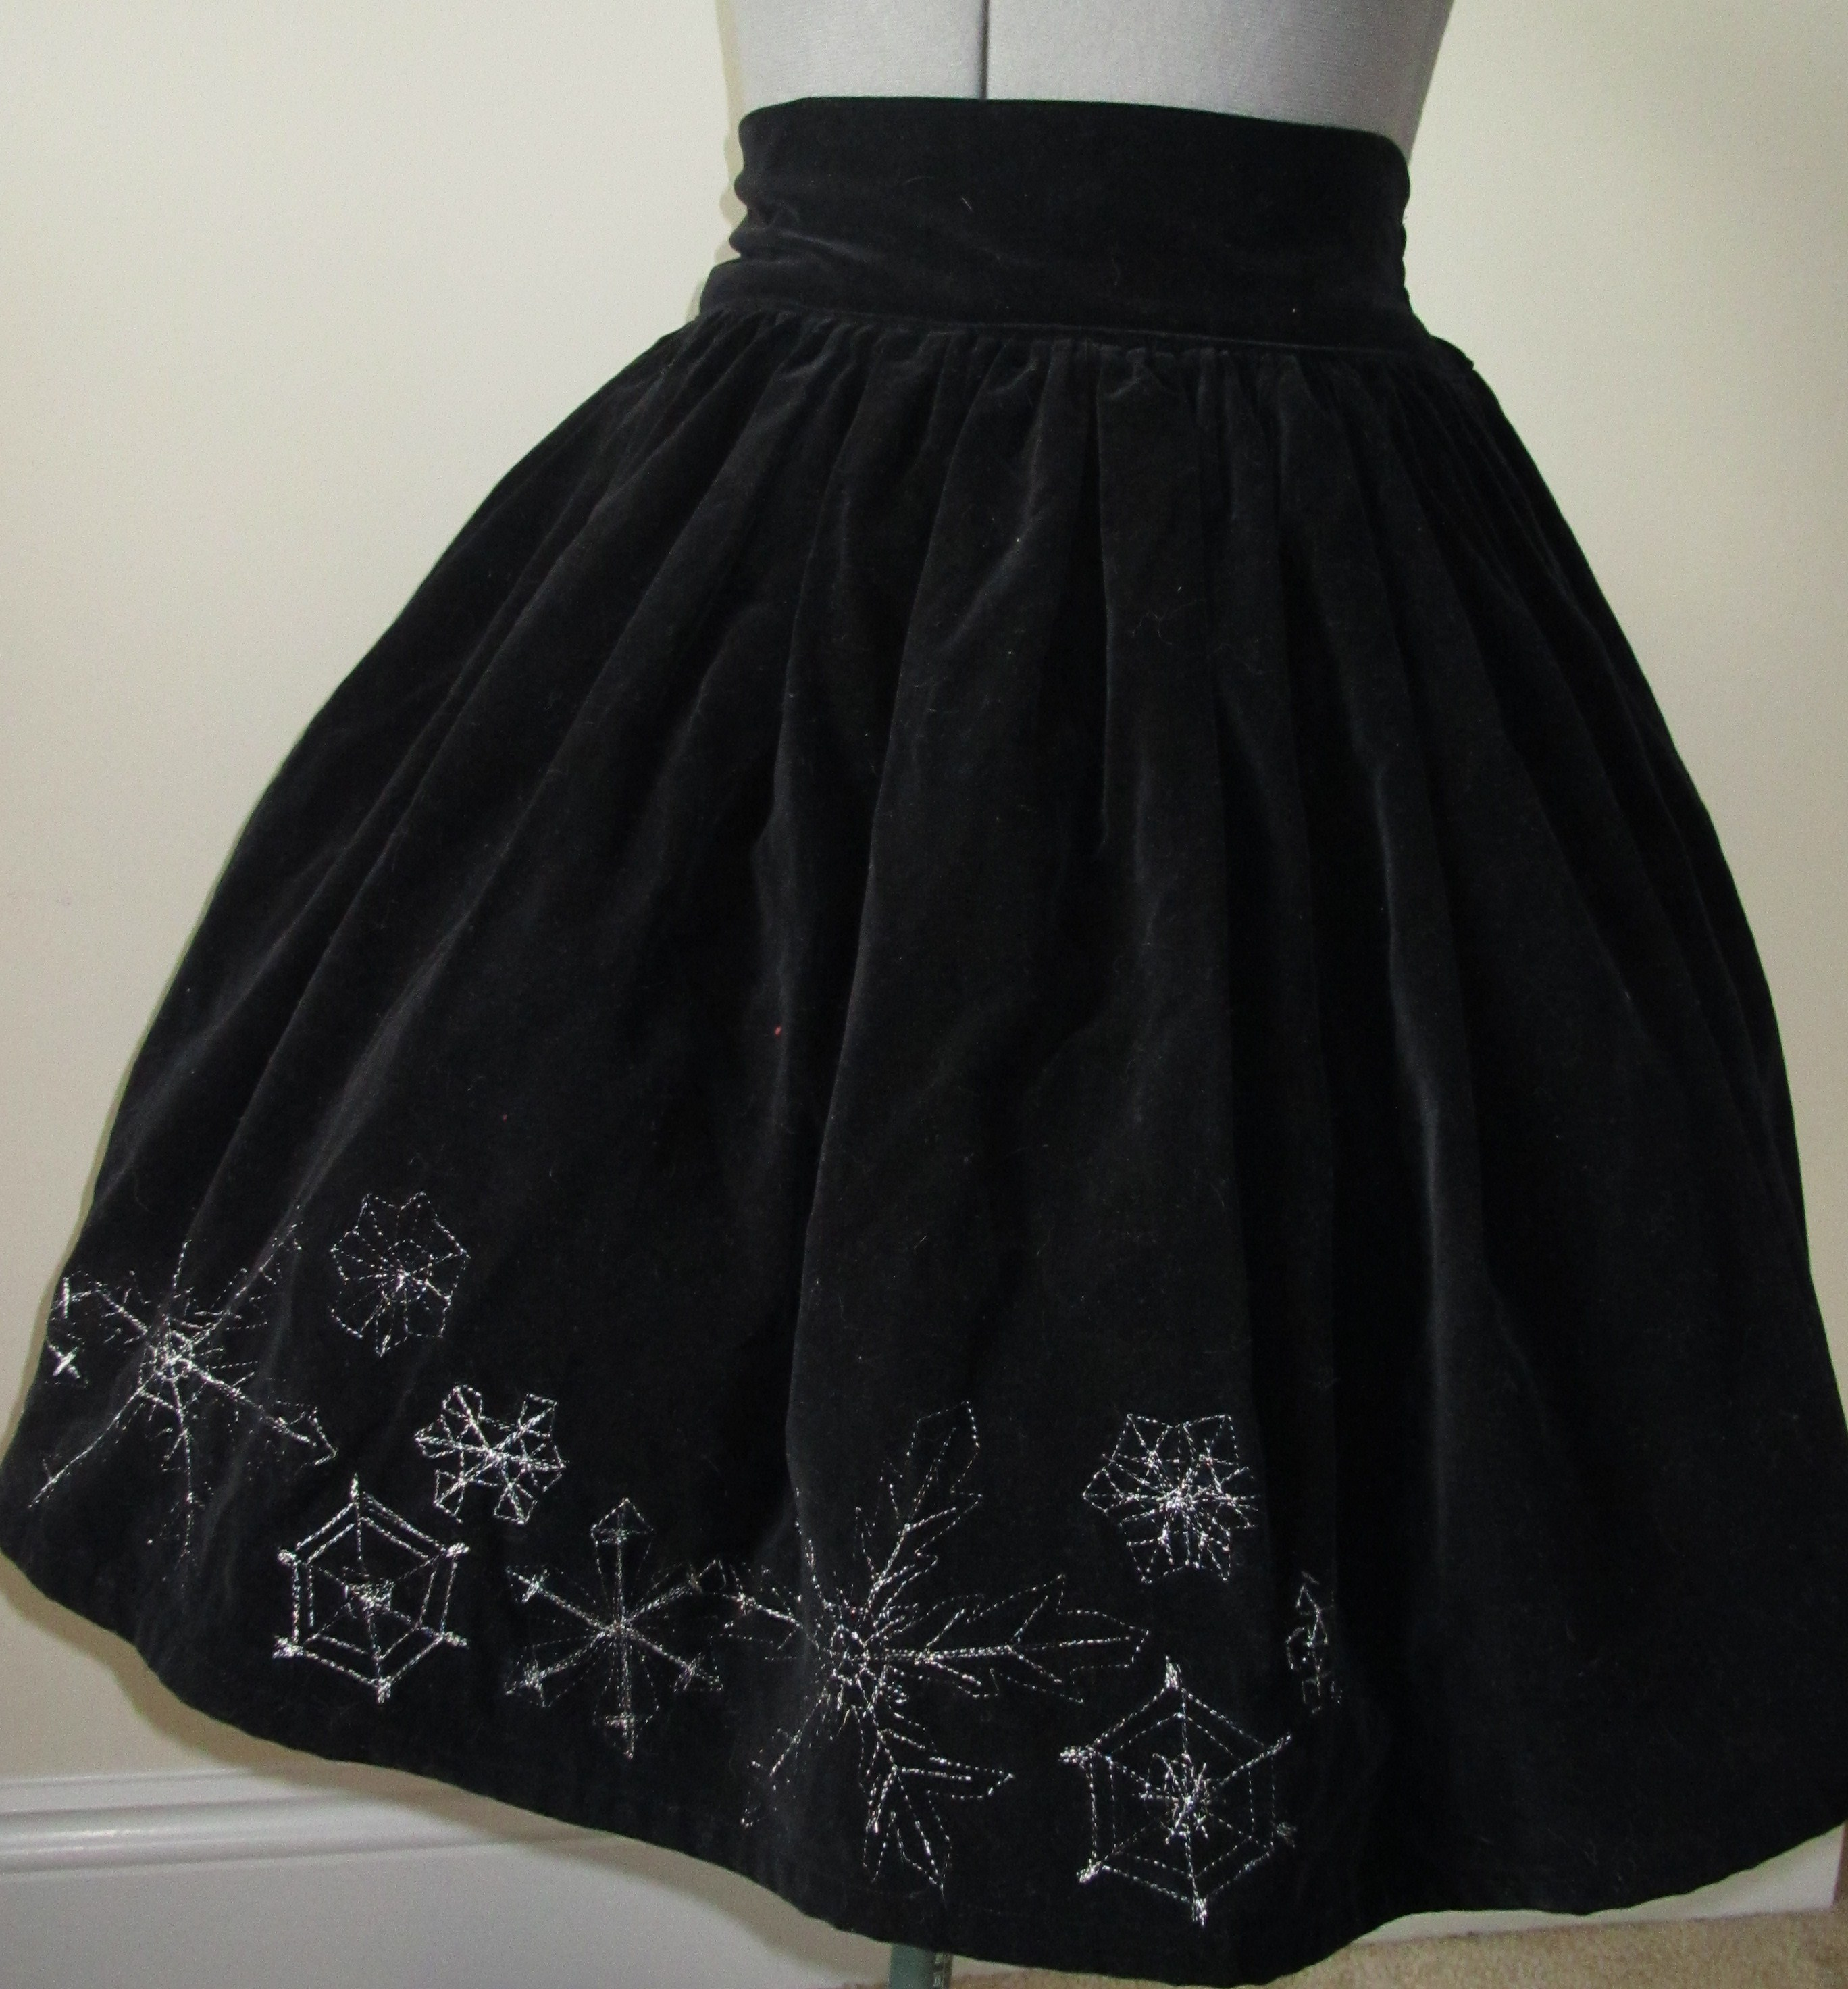 Toxicity Silver Snowflake Black Velvet Skirt Online Store Powered By Storenvy